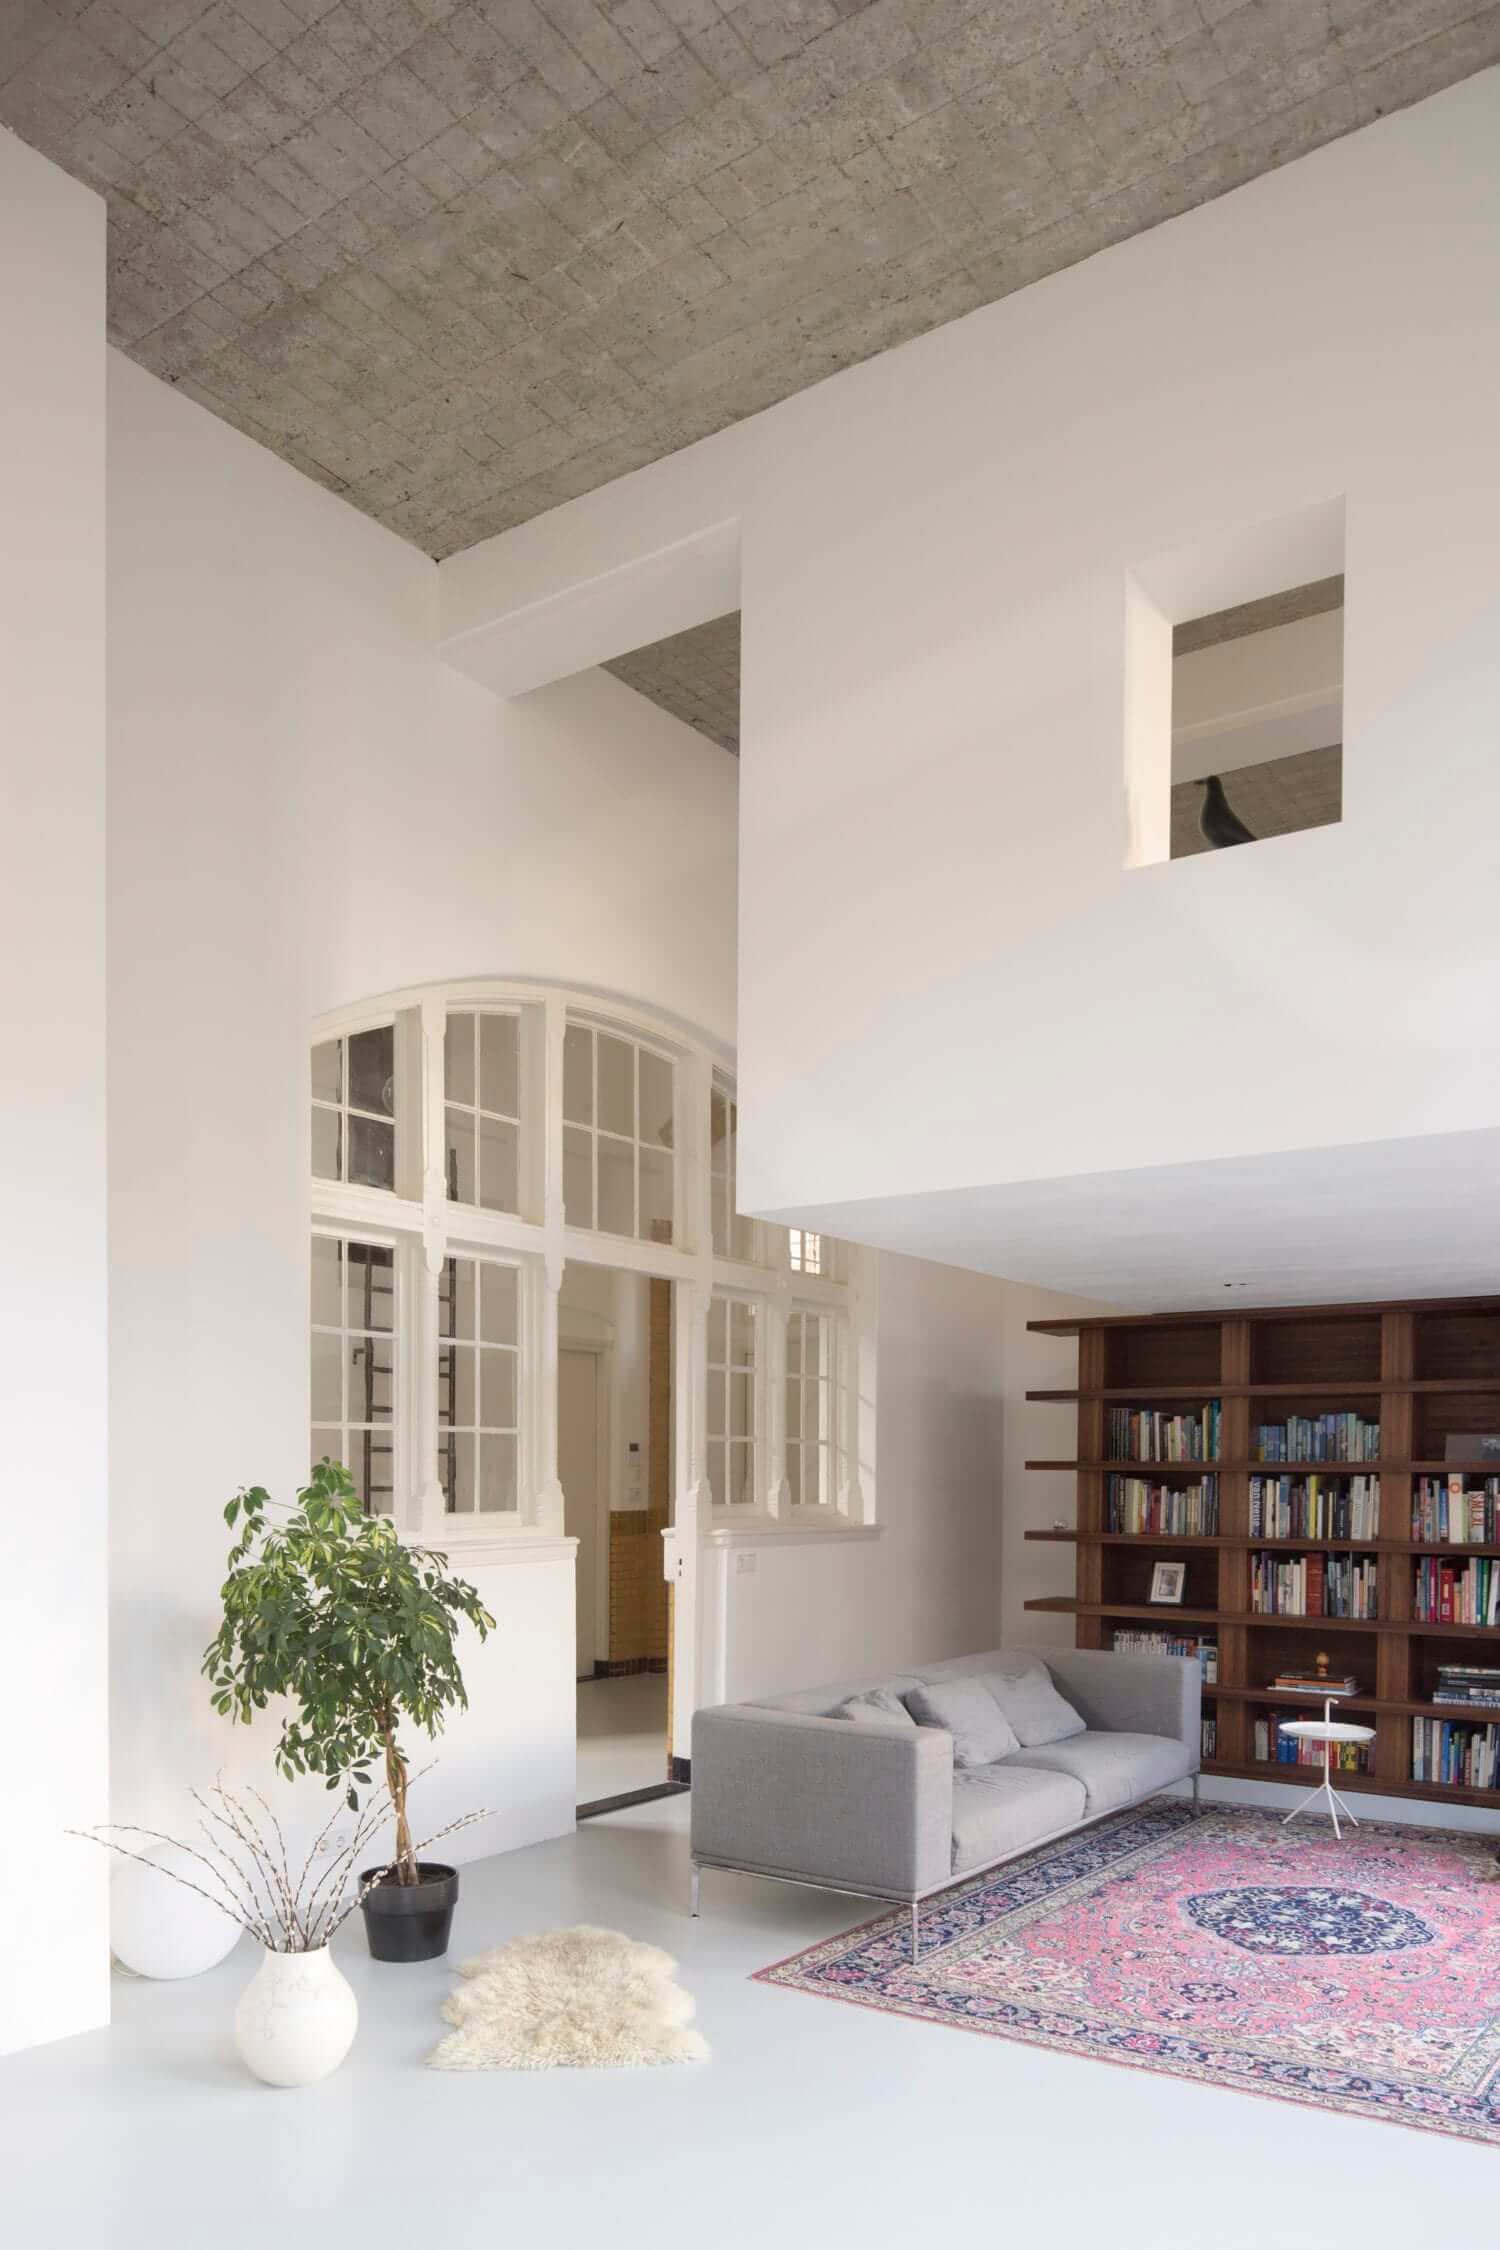 A Minimalistic Loft Apartment in a Former School Building